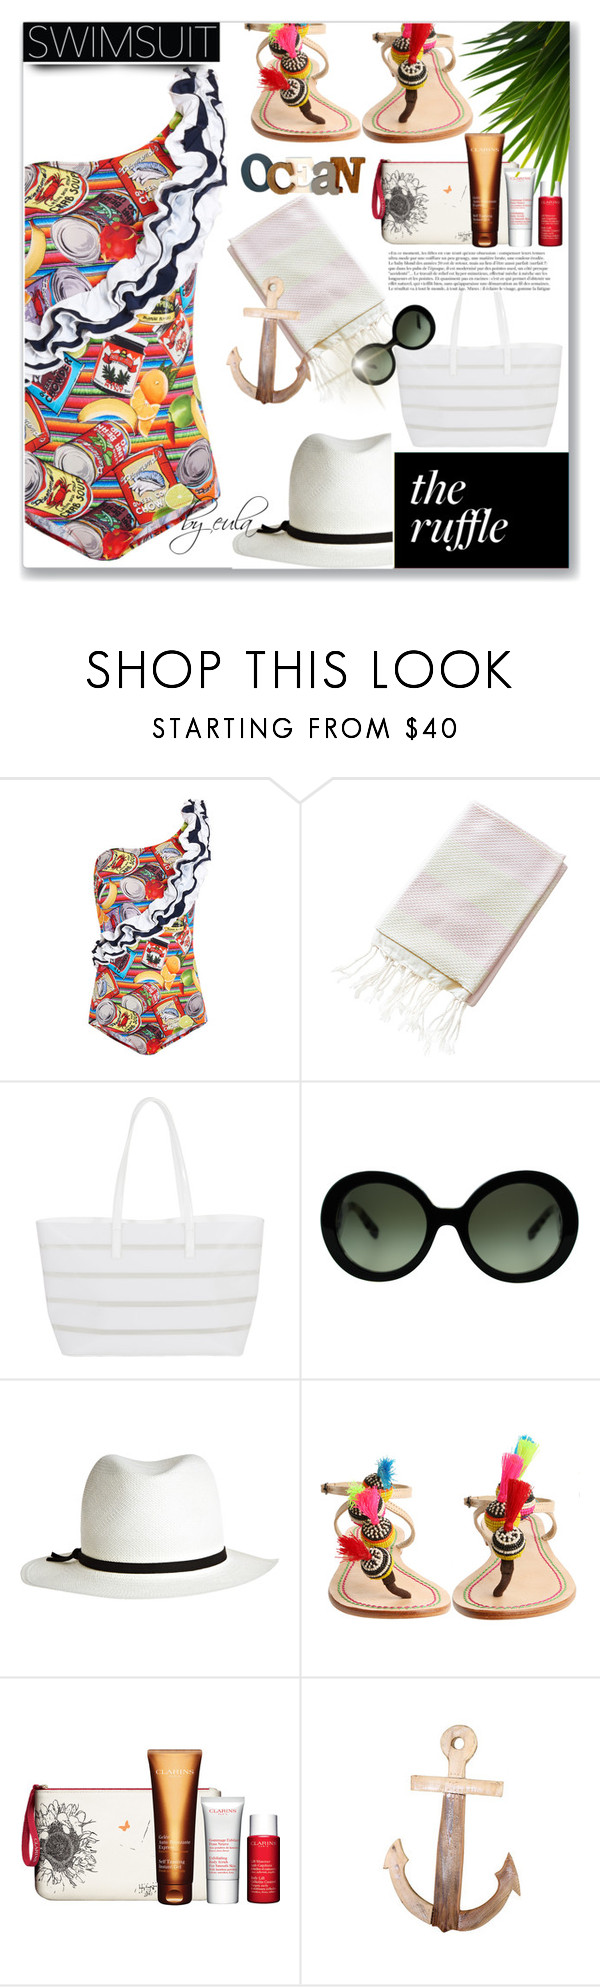 """Ruffled Up Swimwear"" by eula-eldridge-tolliver ❤ liked on Polyvore featuring Stella Jean, BUCO, Anja, Prada, Calypso Private Label, Castañer, Clarins and Dot & Bo"